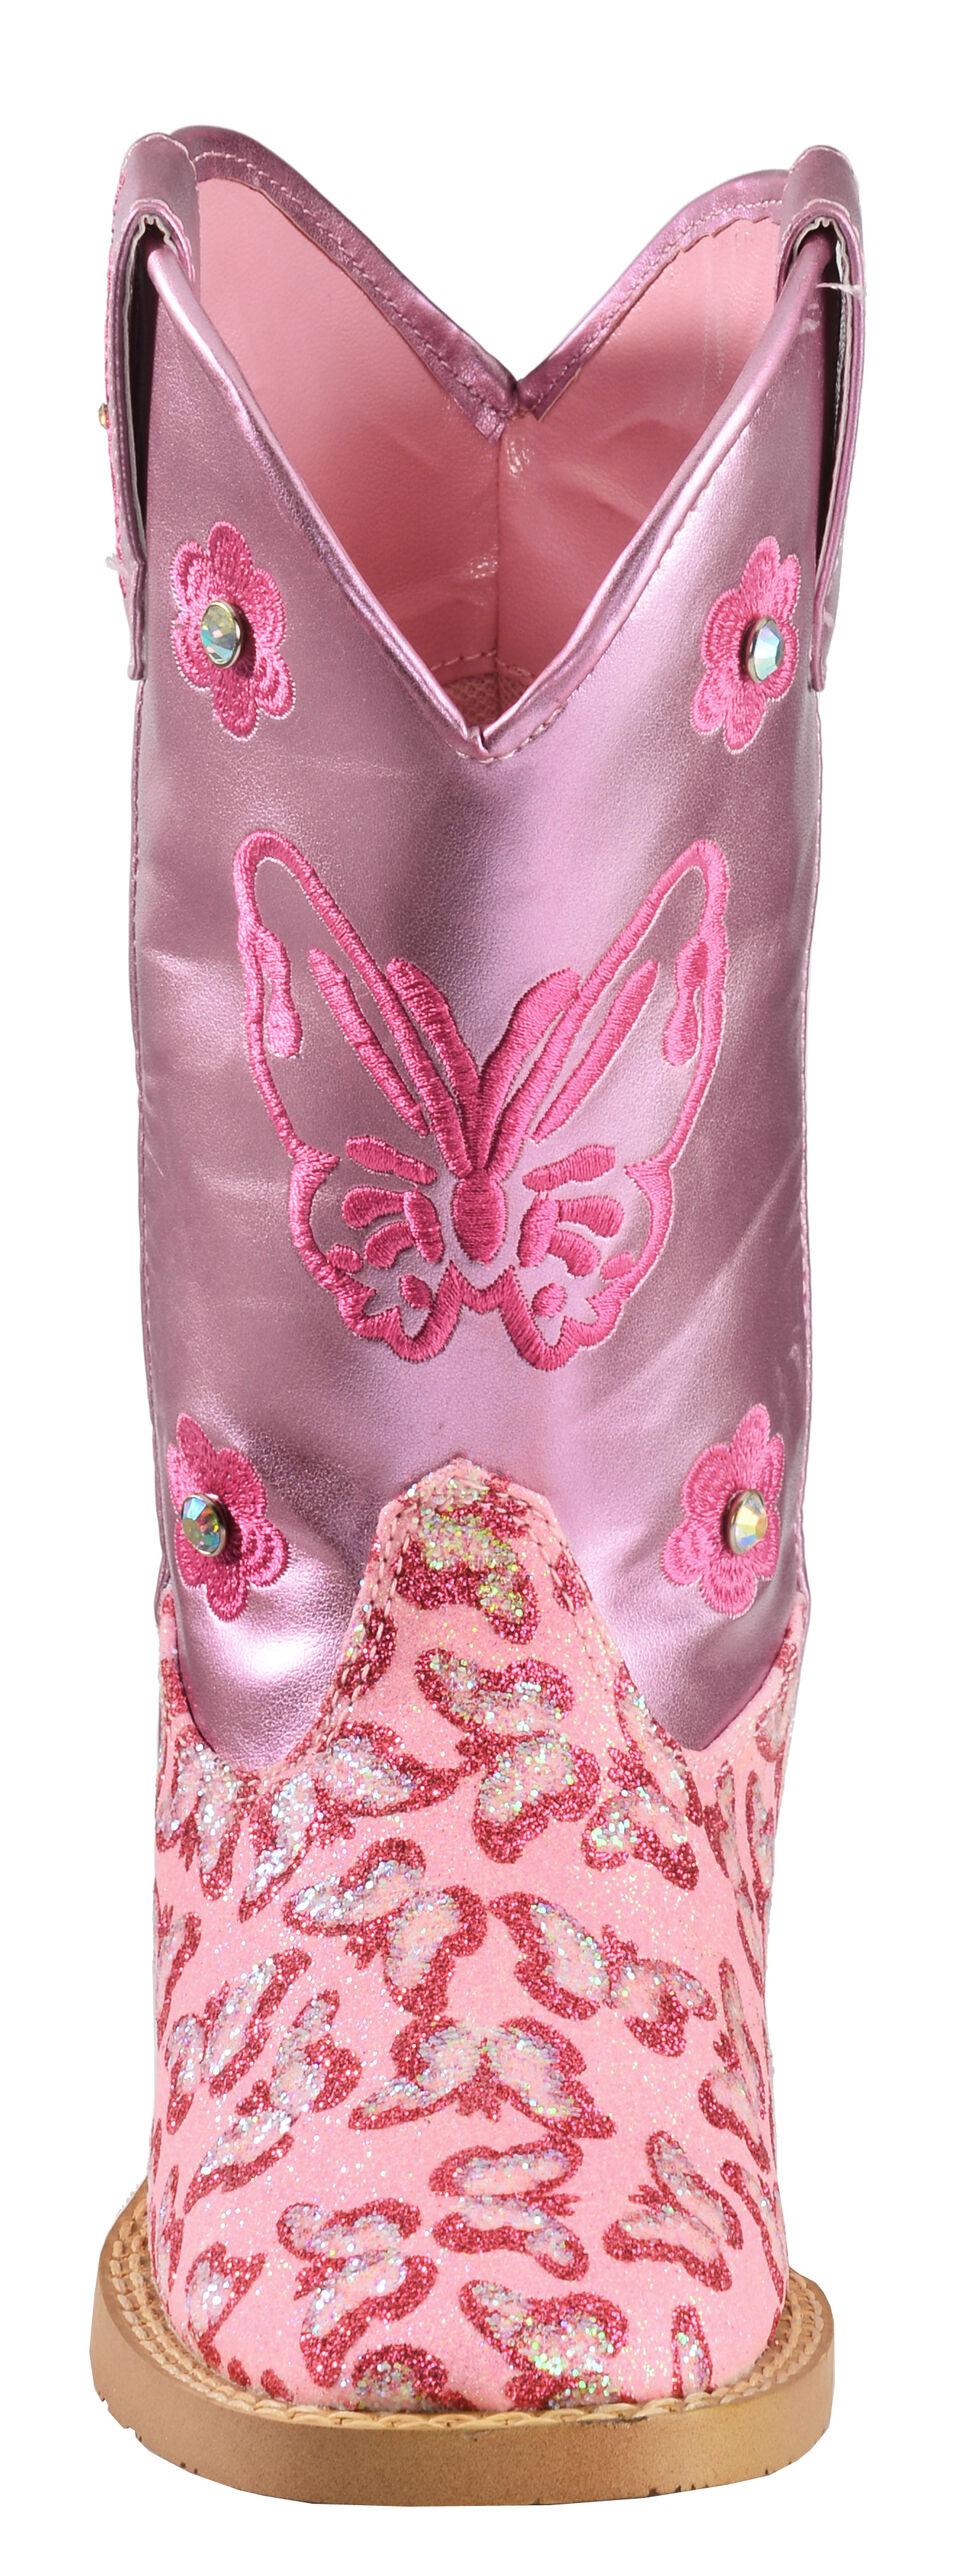 Blazin Roxx Girls' Pink Pecos Glitter Zipper Cowgirl Boots - Square Toe, Pink, hi-res